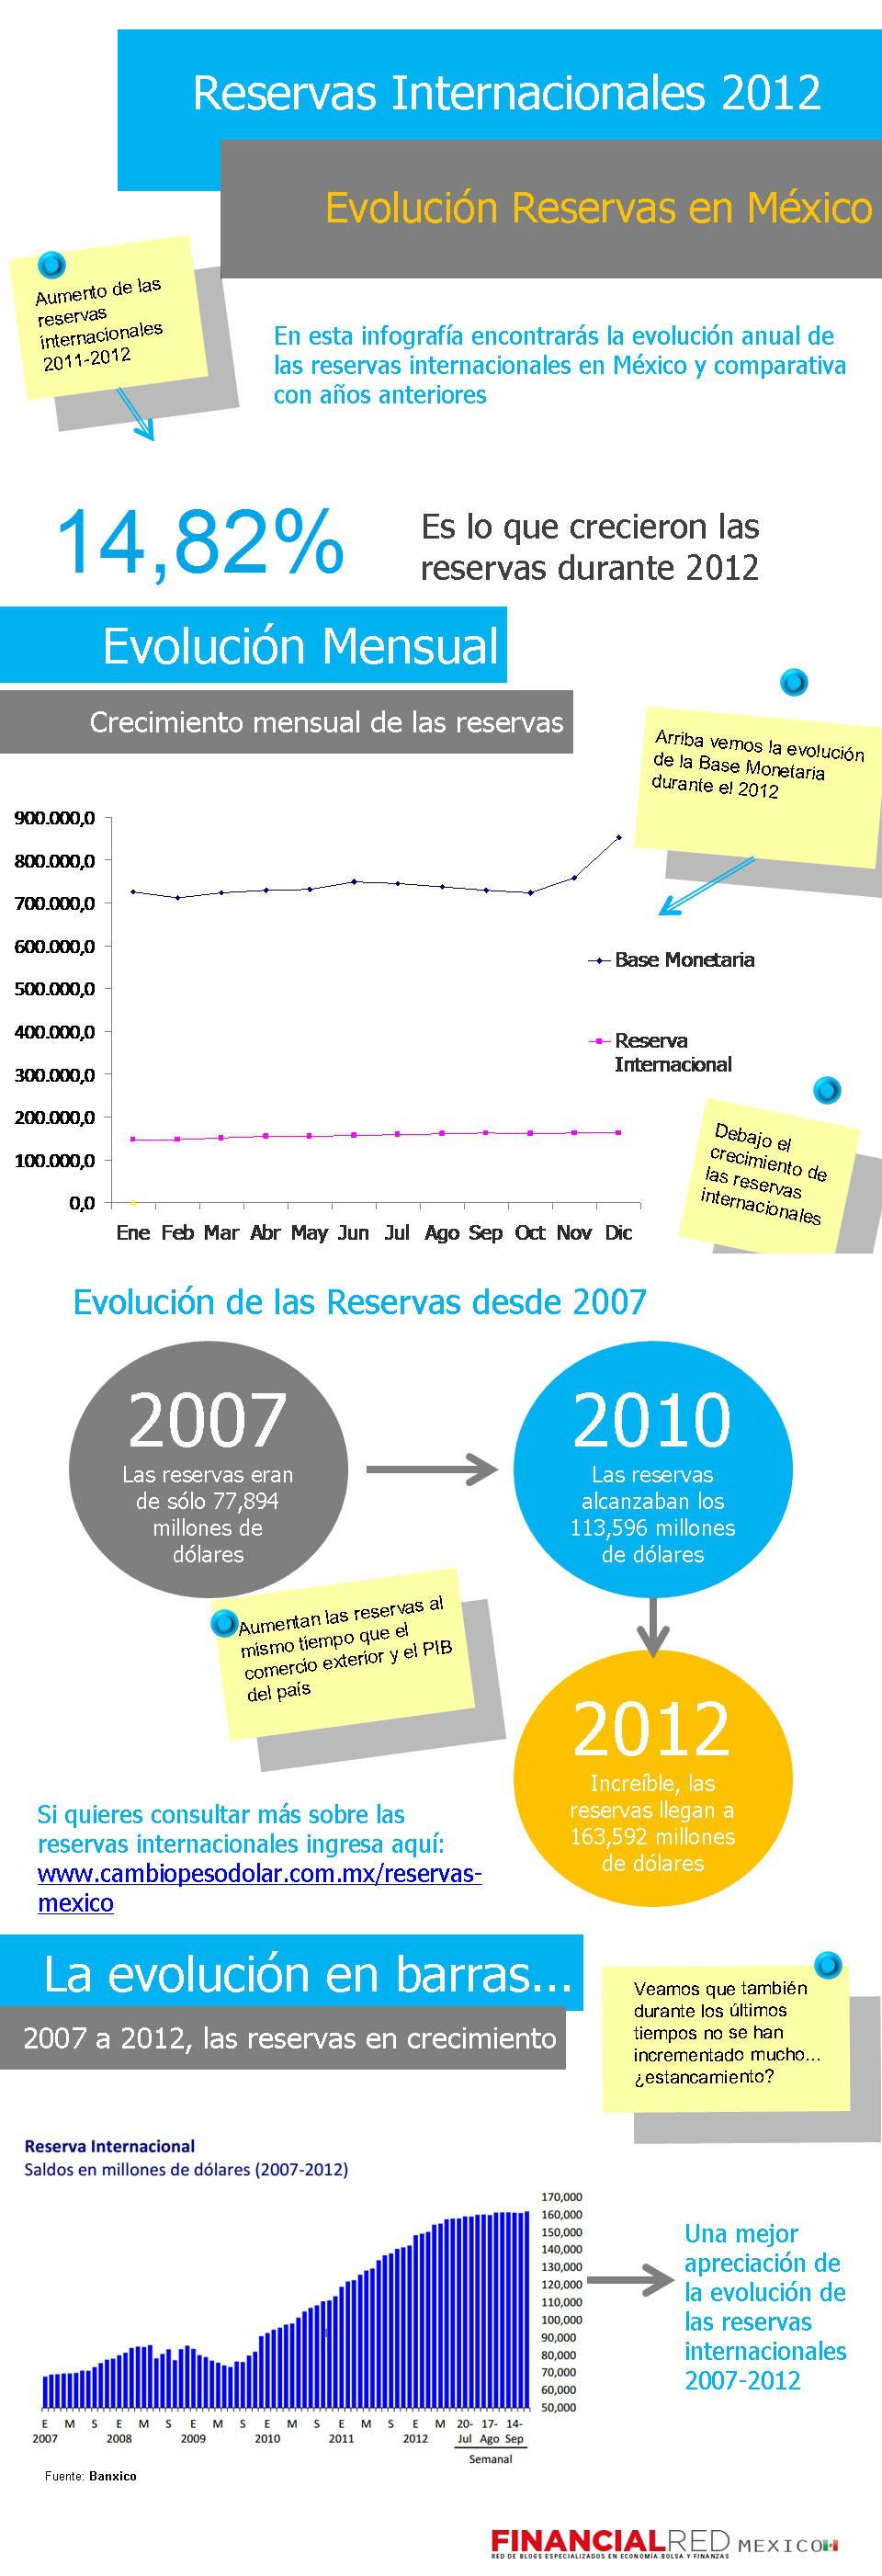 Infografia Reservas Internacionales 2012